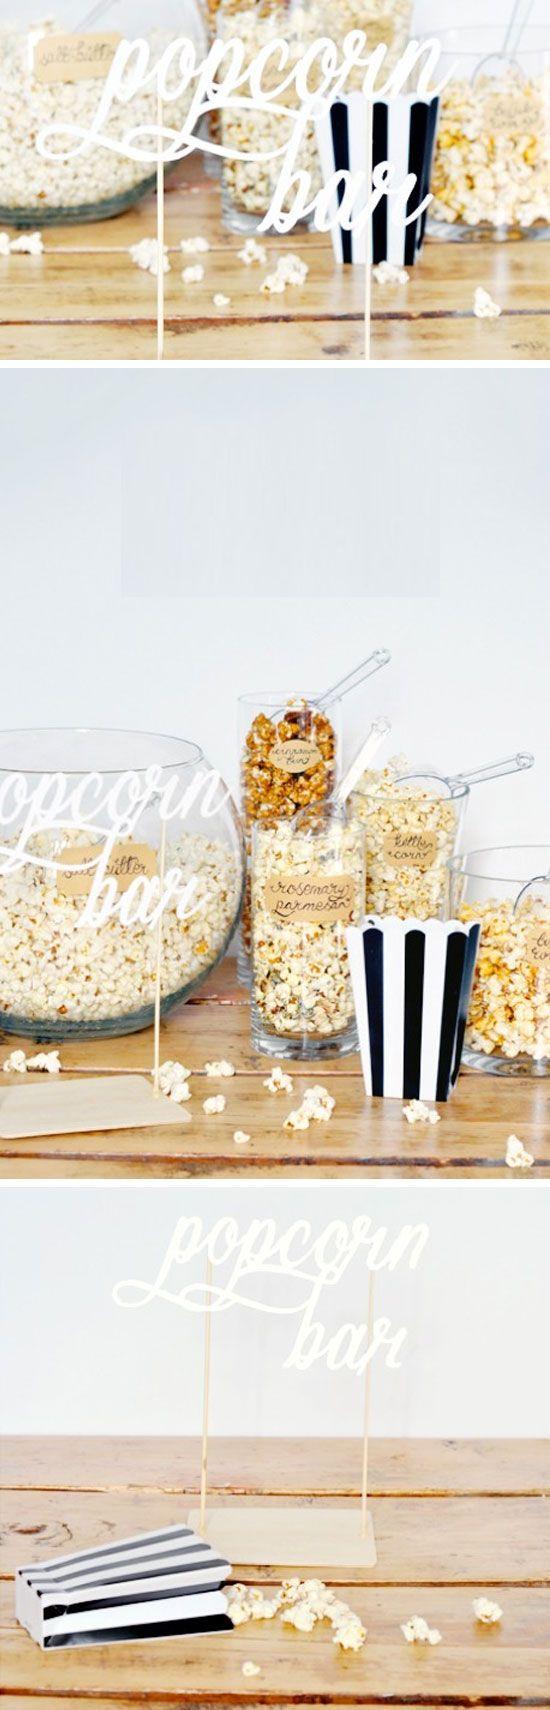 Popcorn Bar | DIY Party Ideas for Teen Girls